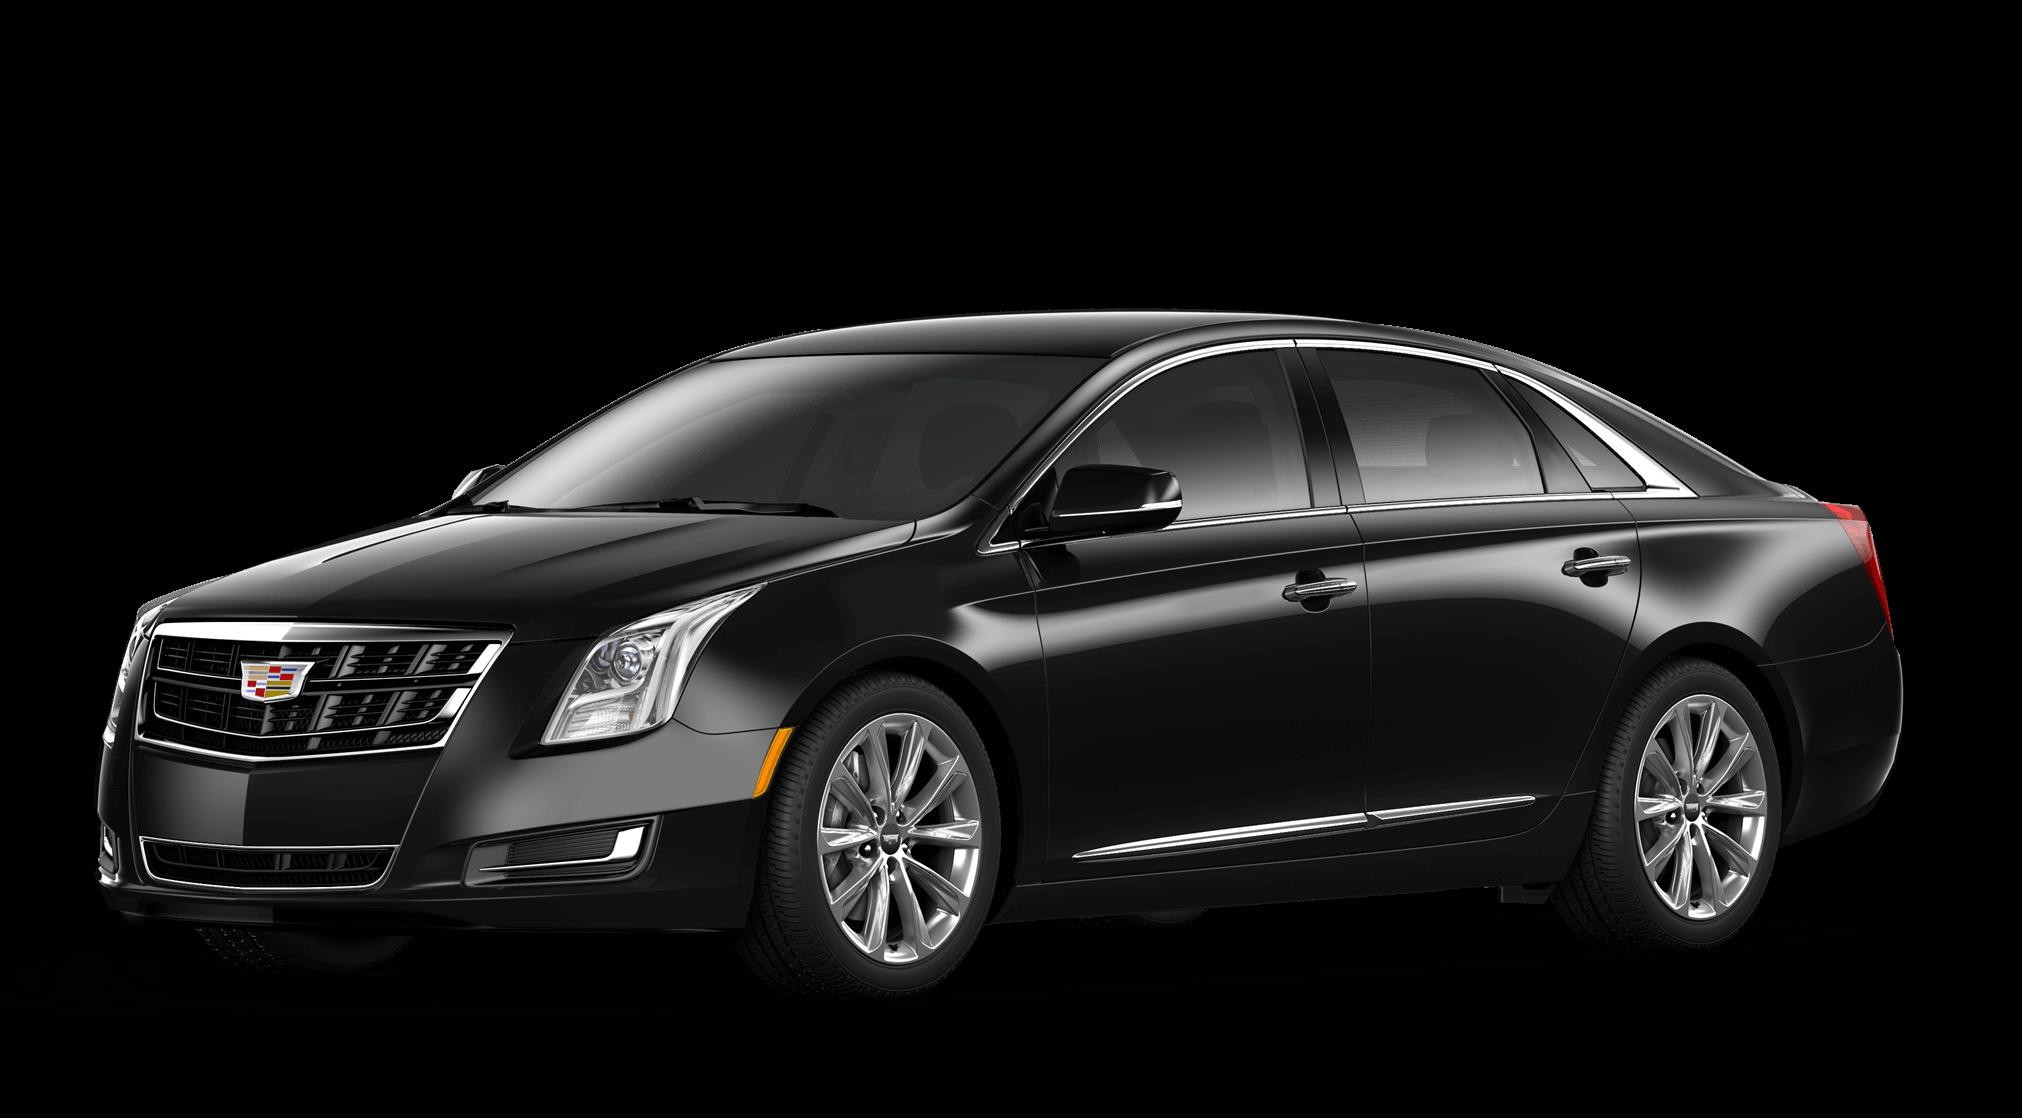 2016 Cadillac XTS Black Raven